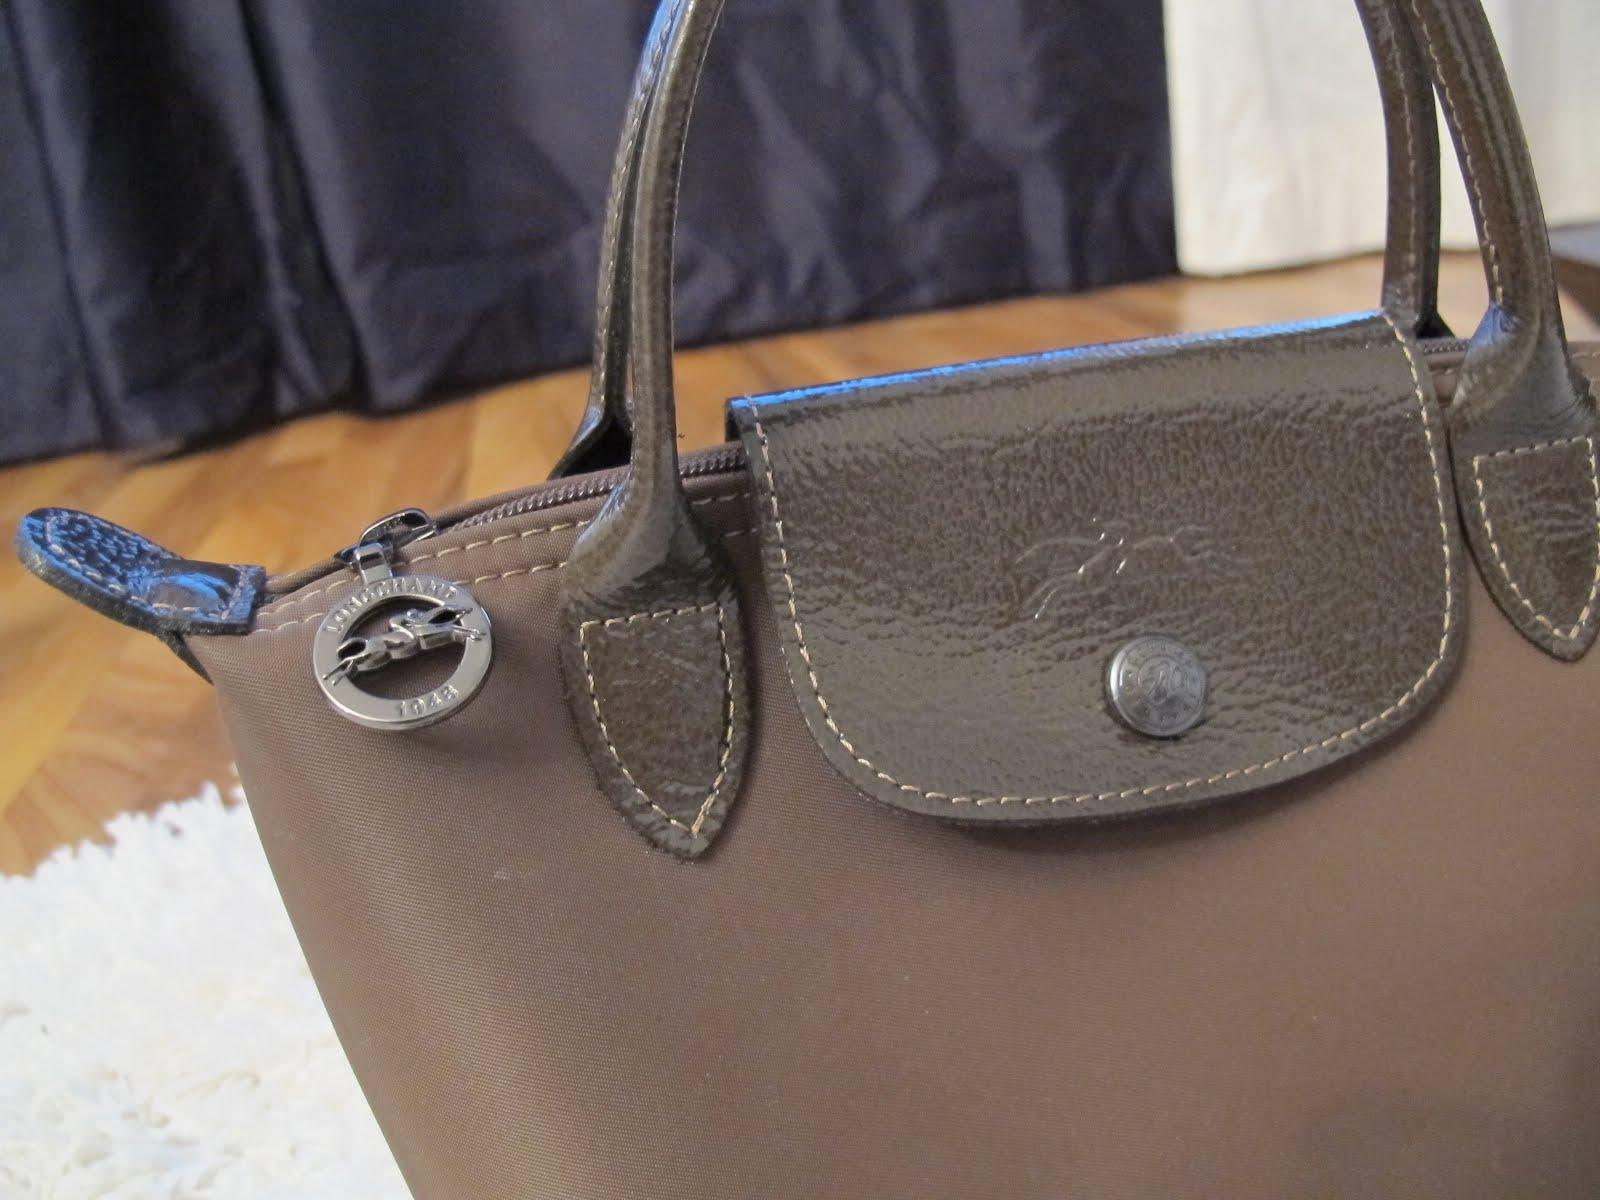 Longchamp Le Pliage Kosmetiikka Laukku : Myynniss? longchamp vol ostolakossa